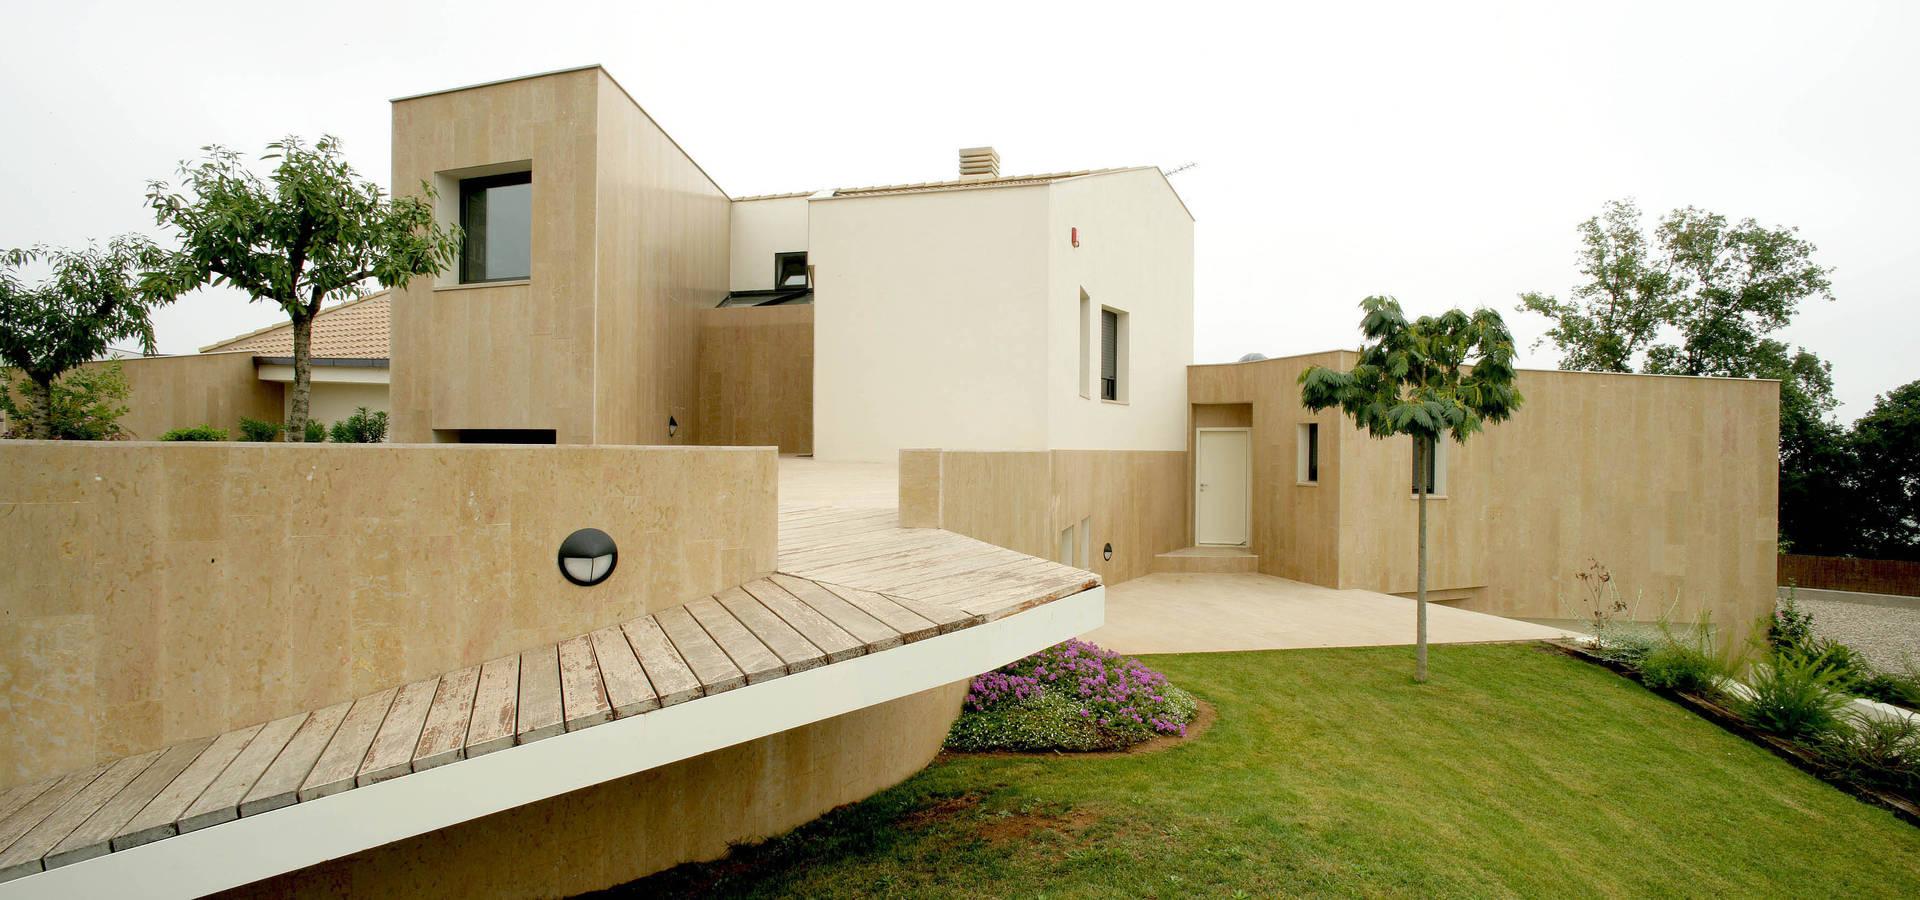 MIAS Architects